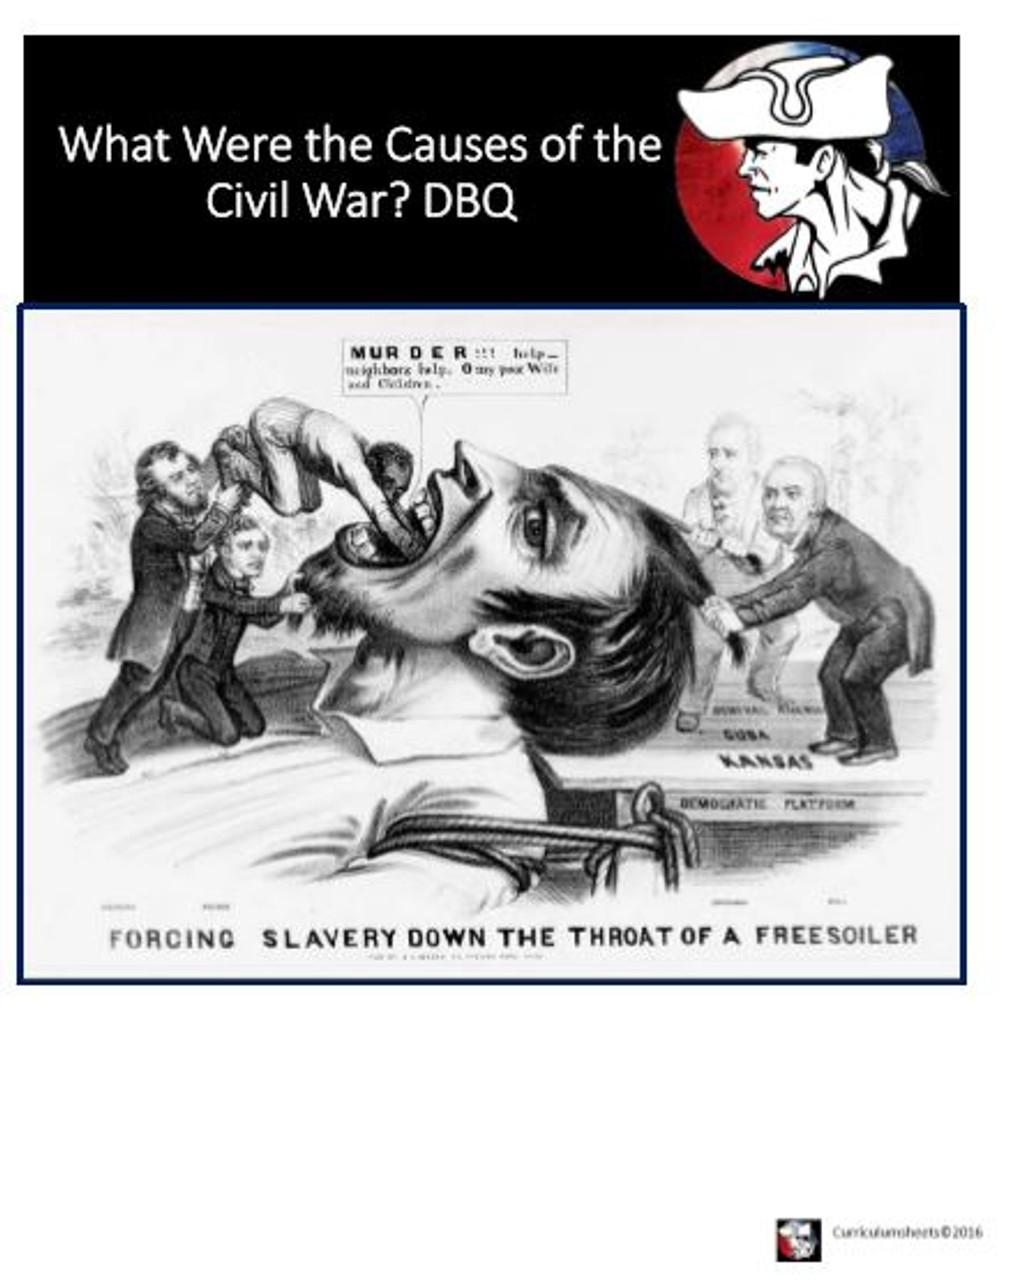 DBQ Causes of the American Civil War